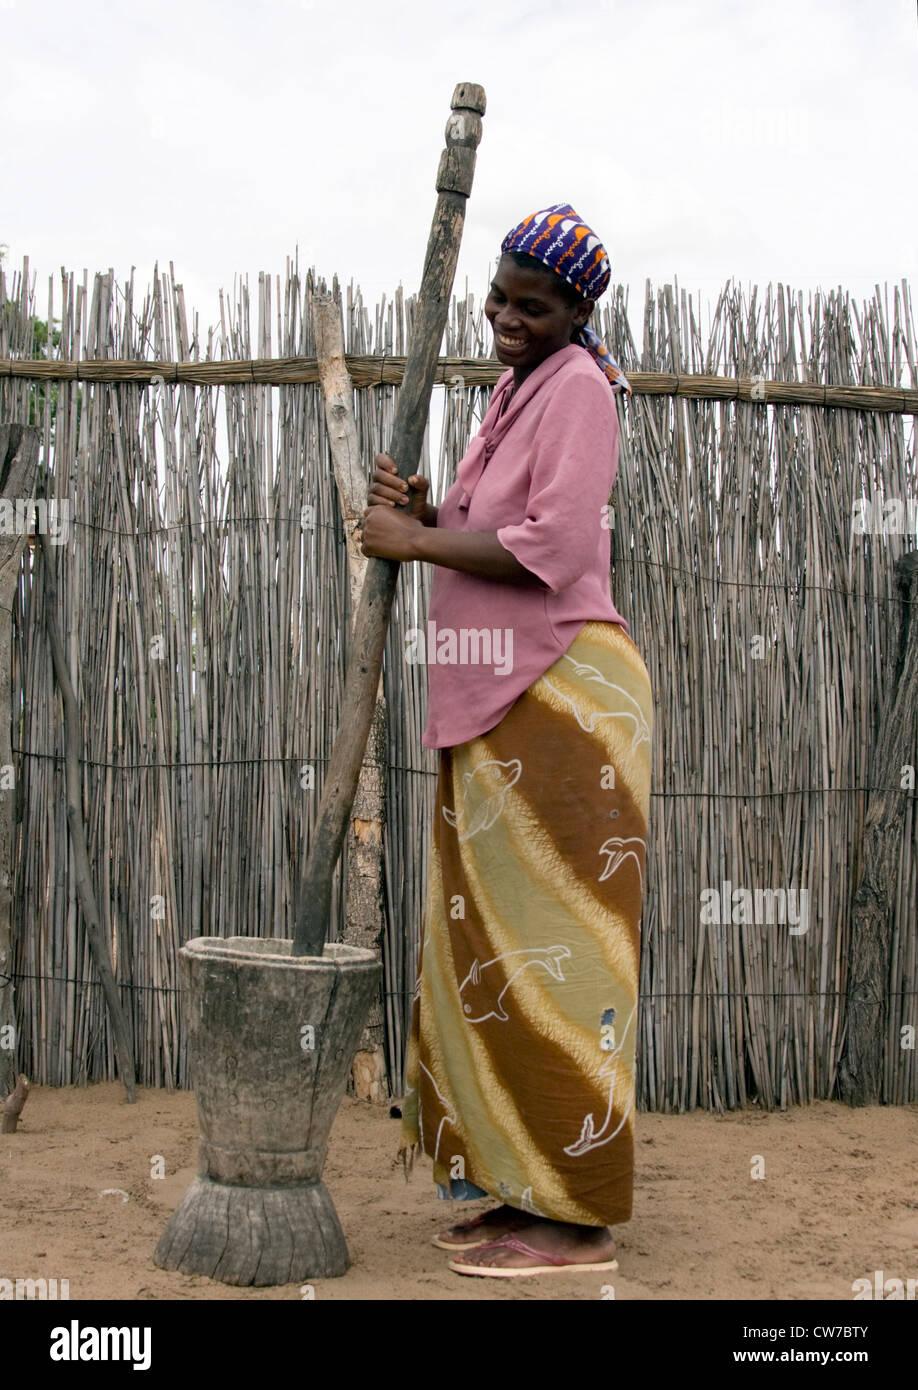 native woman bruising grains , Namibia, Mahango National Park - Stock Image